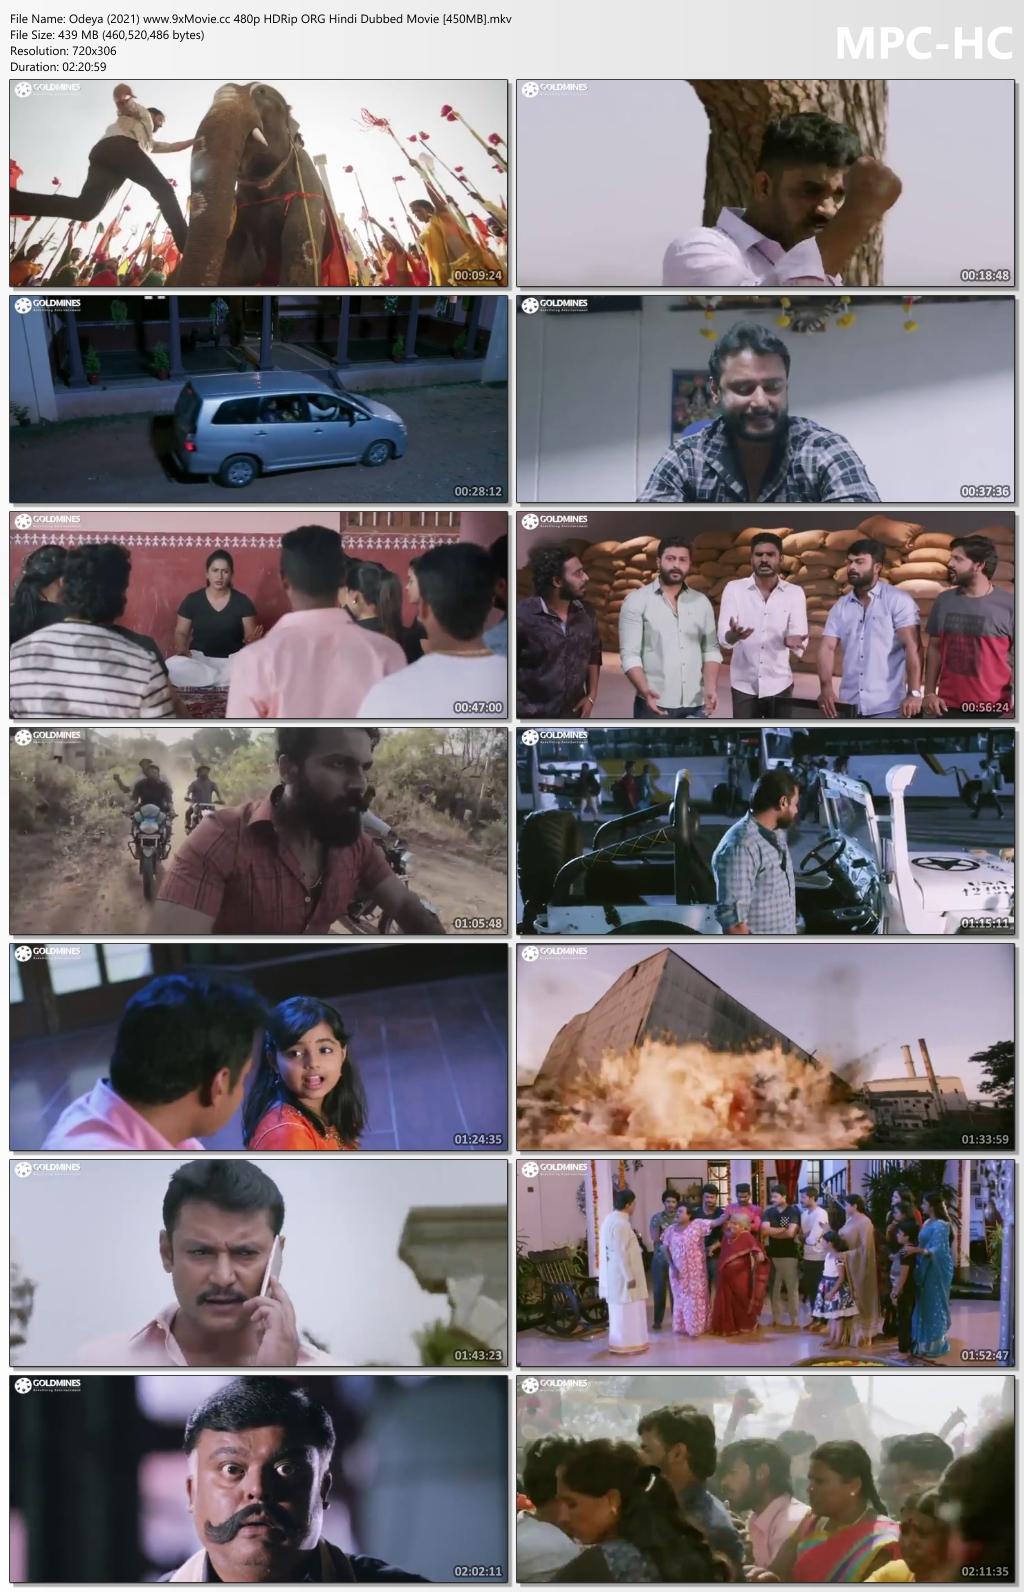 Odeya-2021-www-9x-Movie-cc-480p-HDRip-ORG-Hindi-Dubbed-Movie-450-MB-mkv